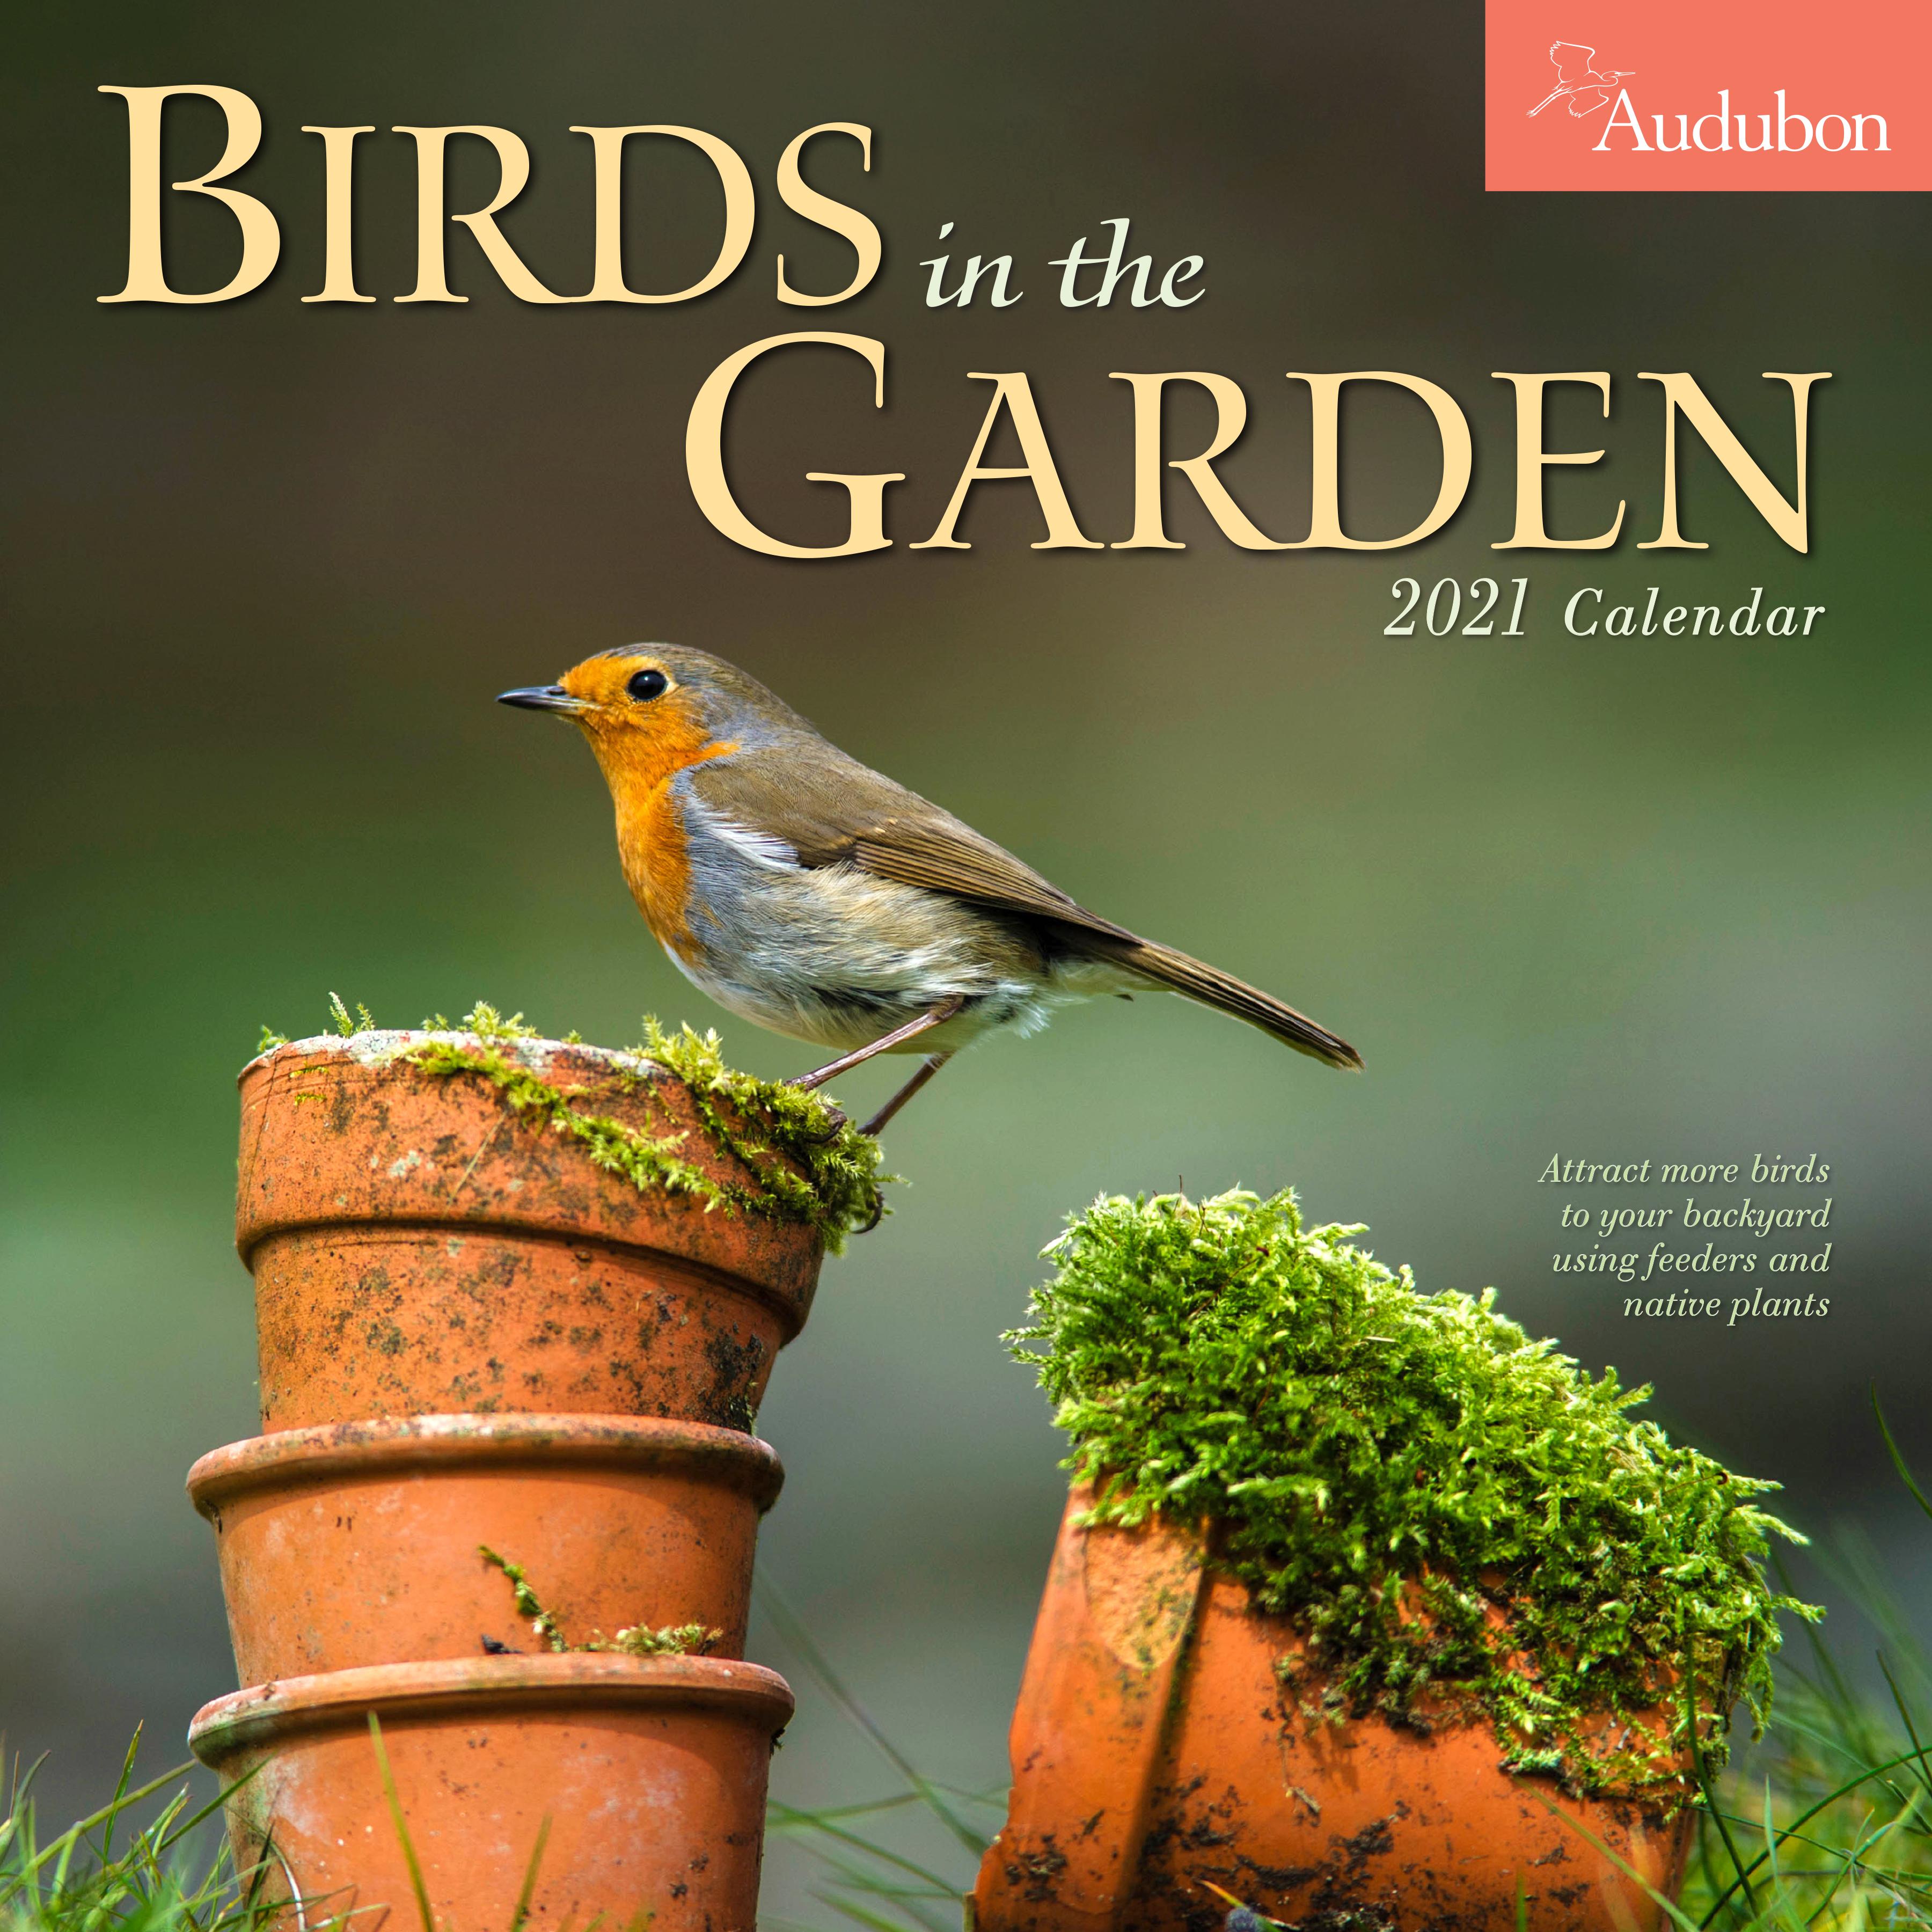 Audubon Bird Calendar 2021 Audubon Birds in the Garden Wall Calendar 2021   Workman Publishing